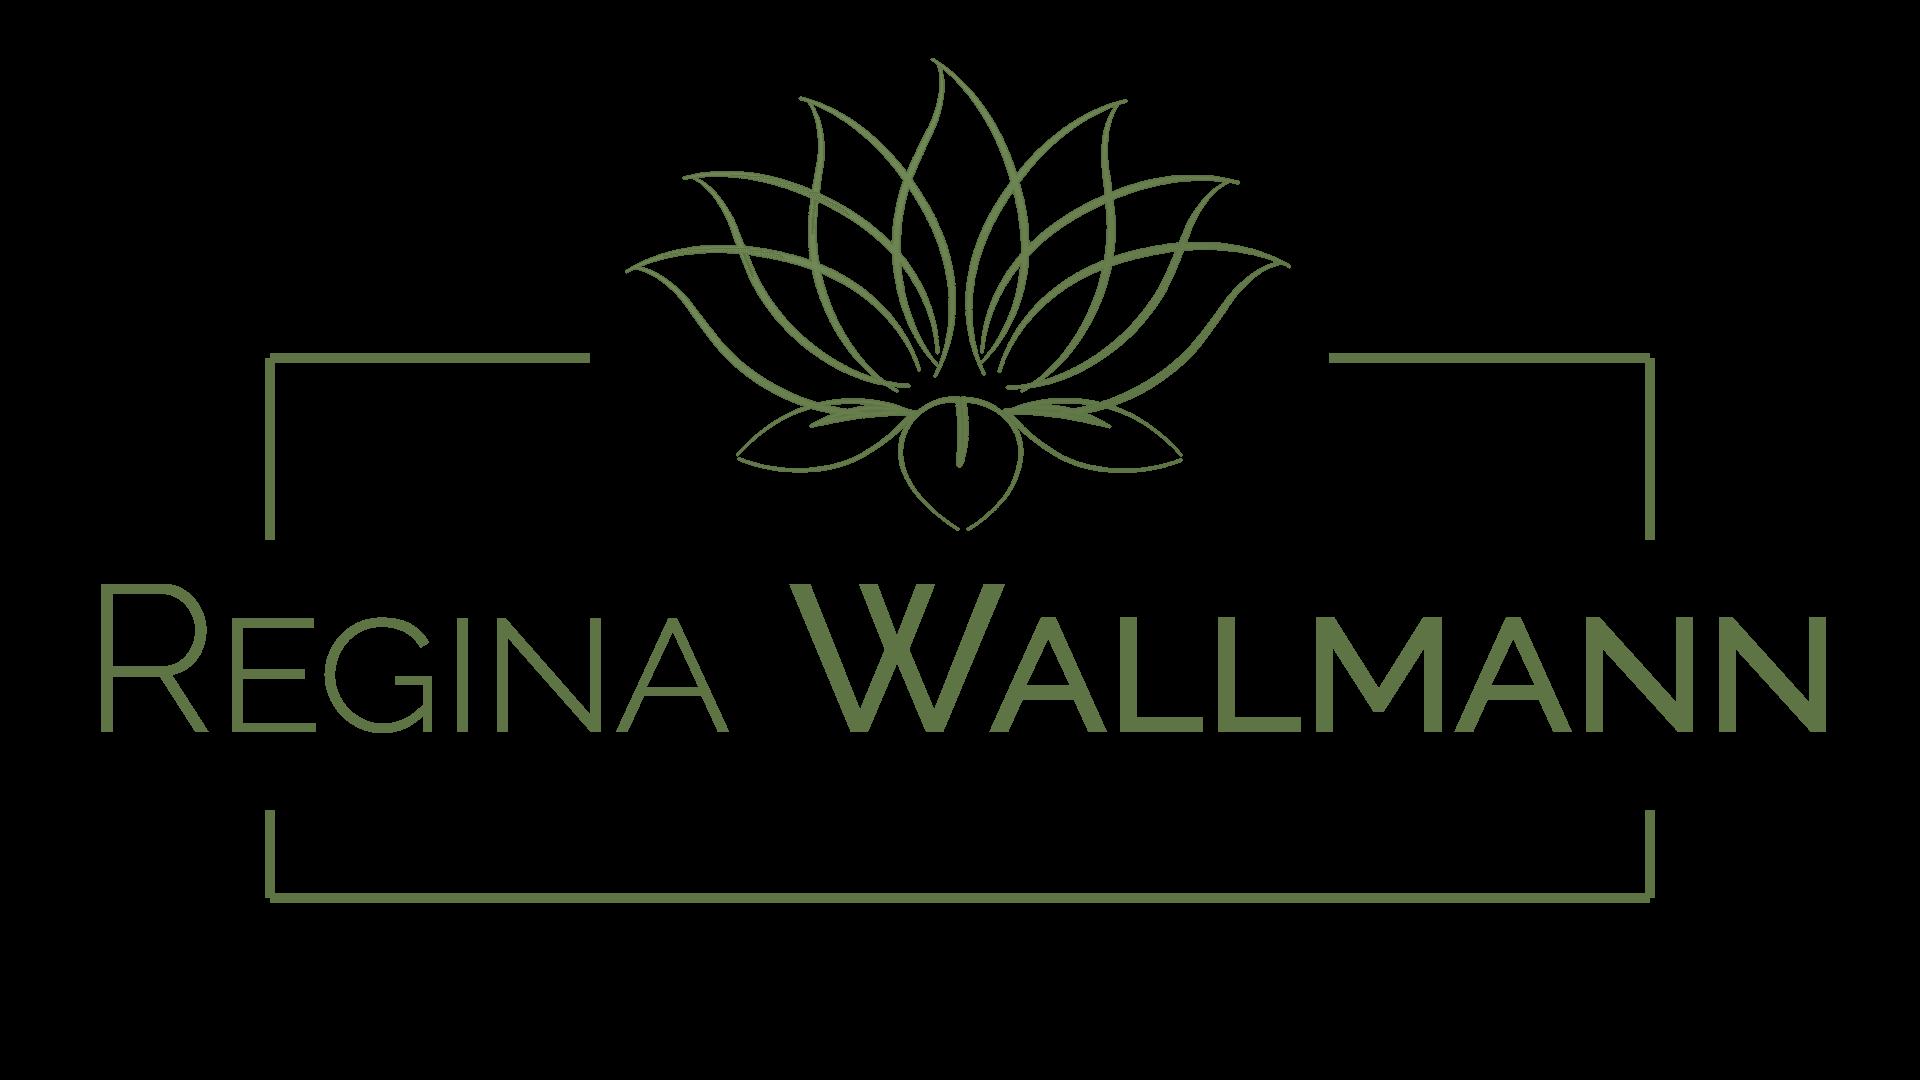 Regina Wallmann